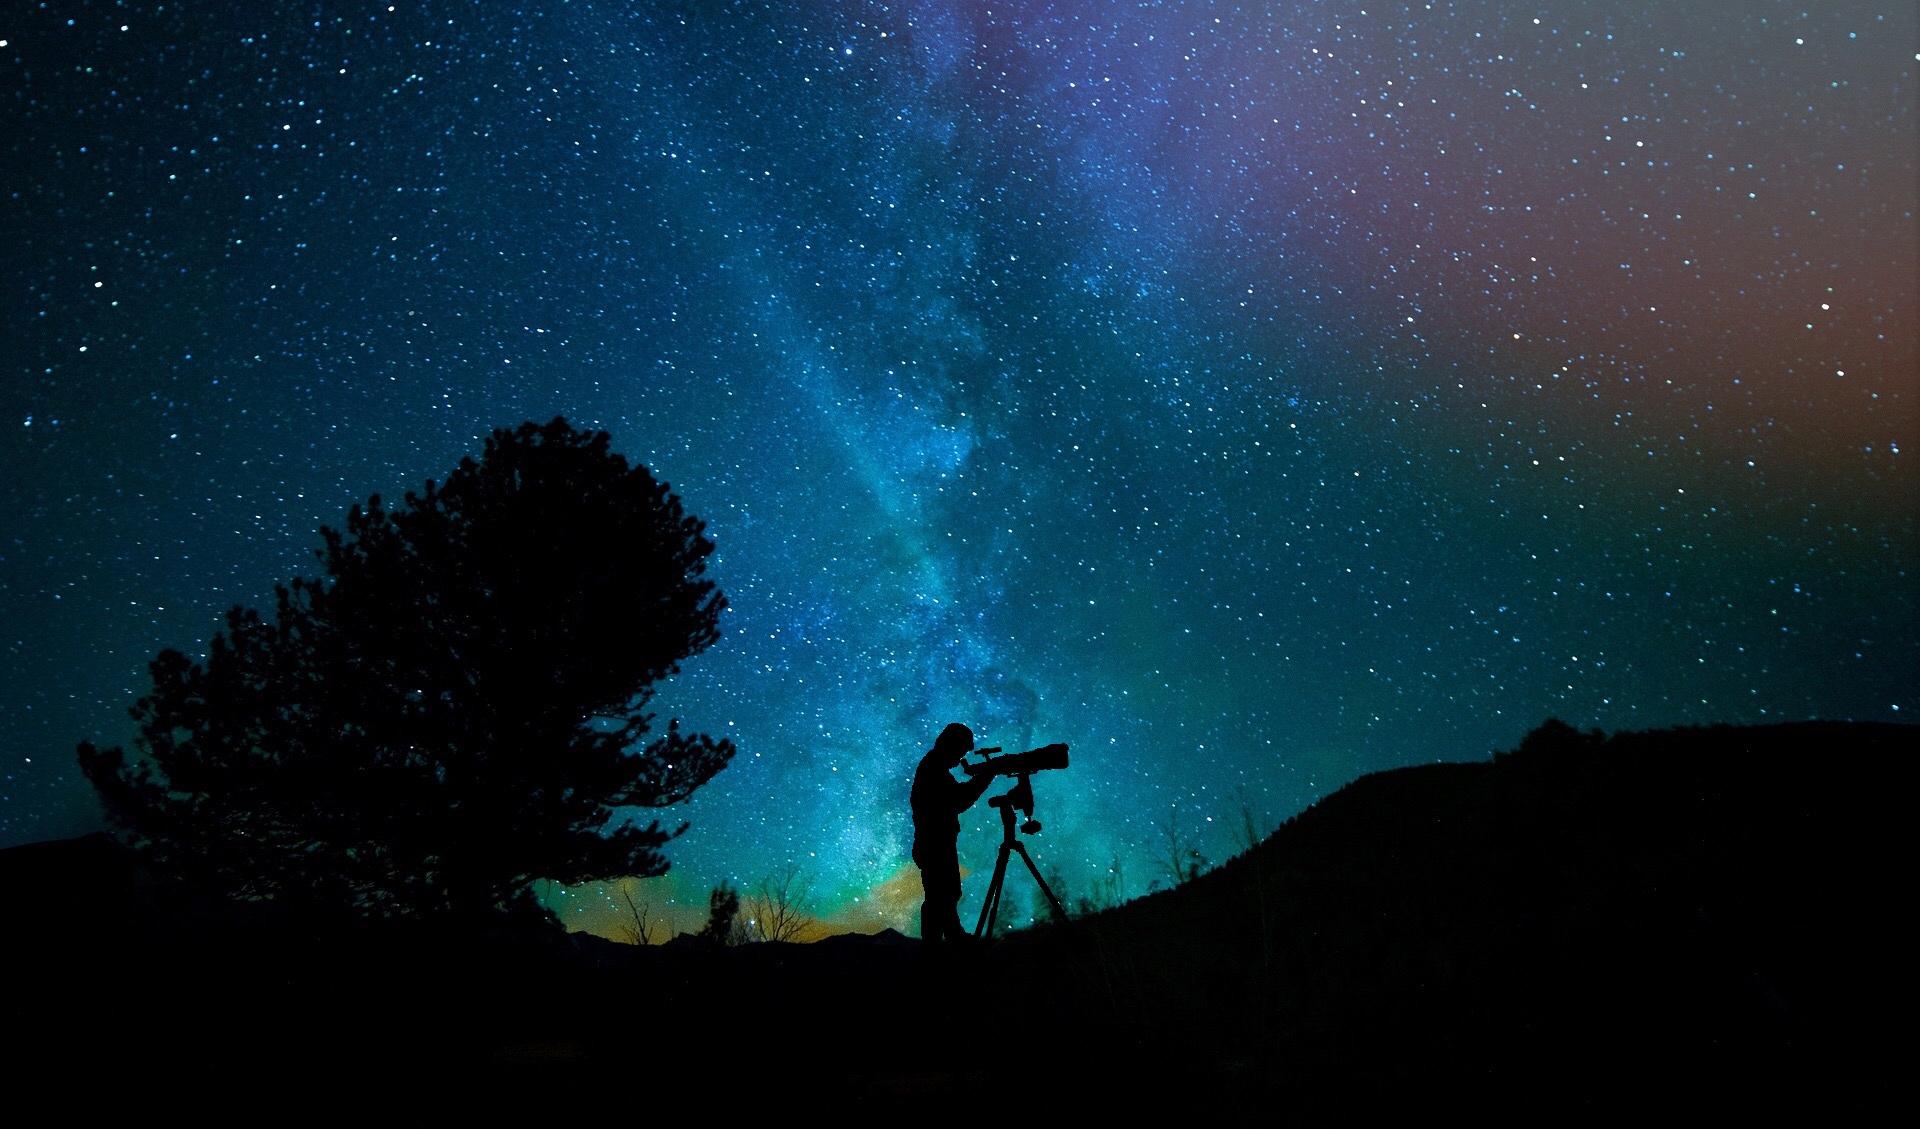 Wallpaper Nature Night Voie Lactee Galaxy Milkyway